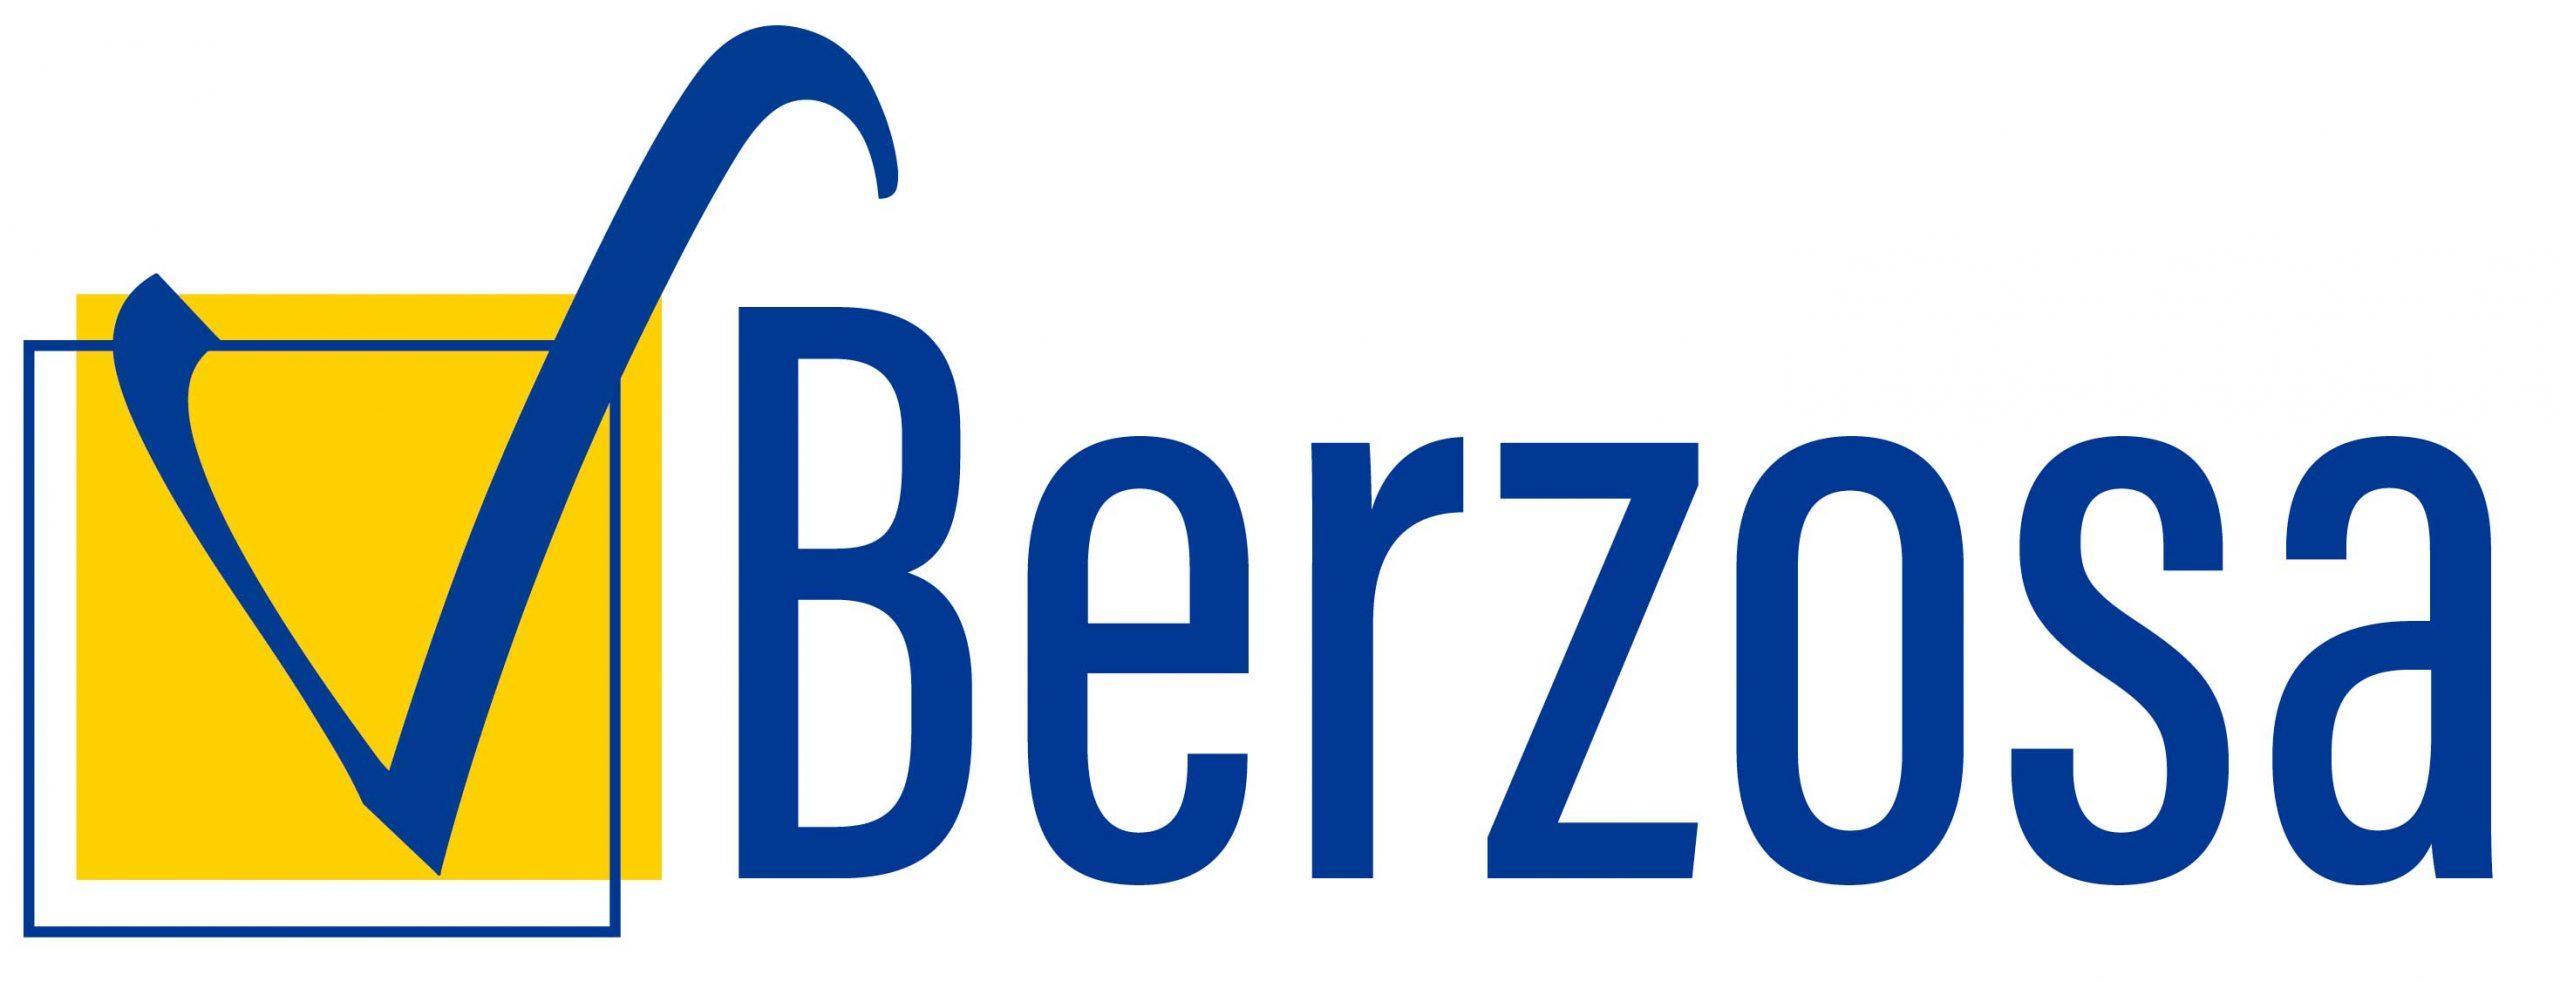 Vicente Berzosa